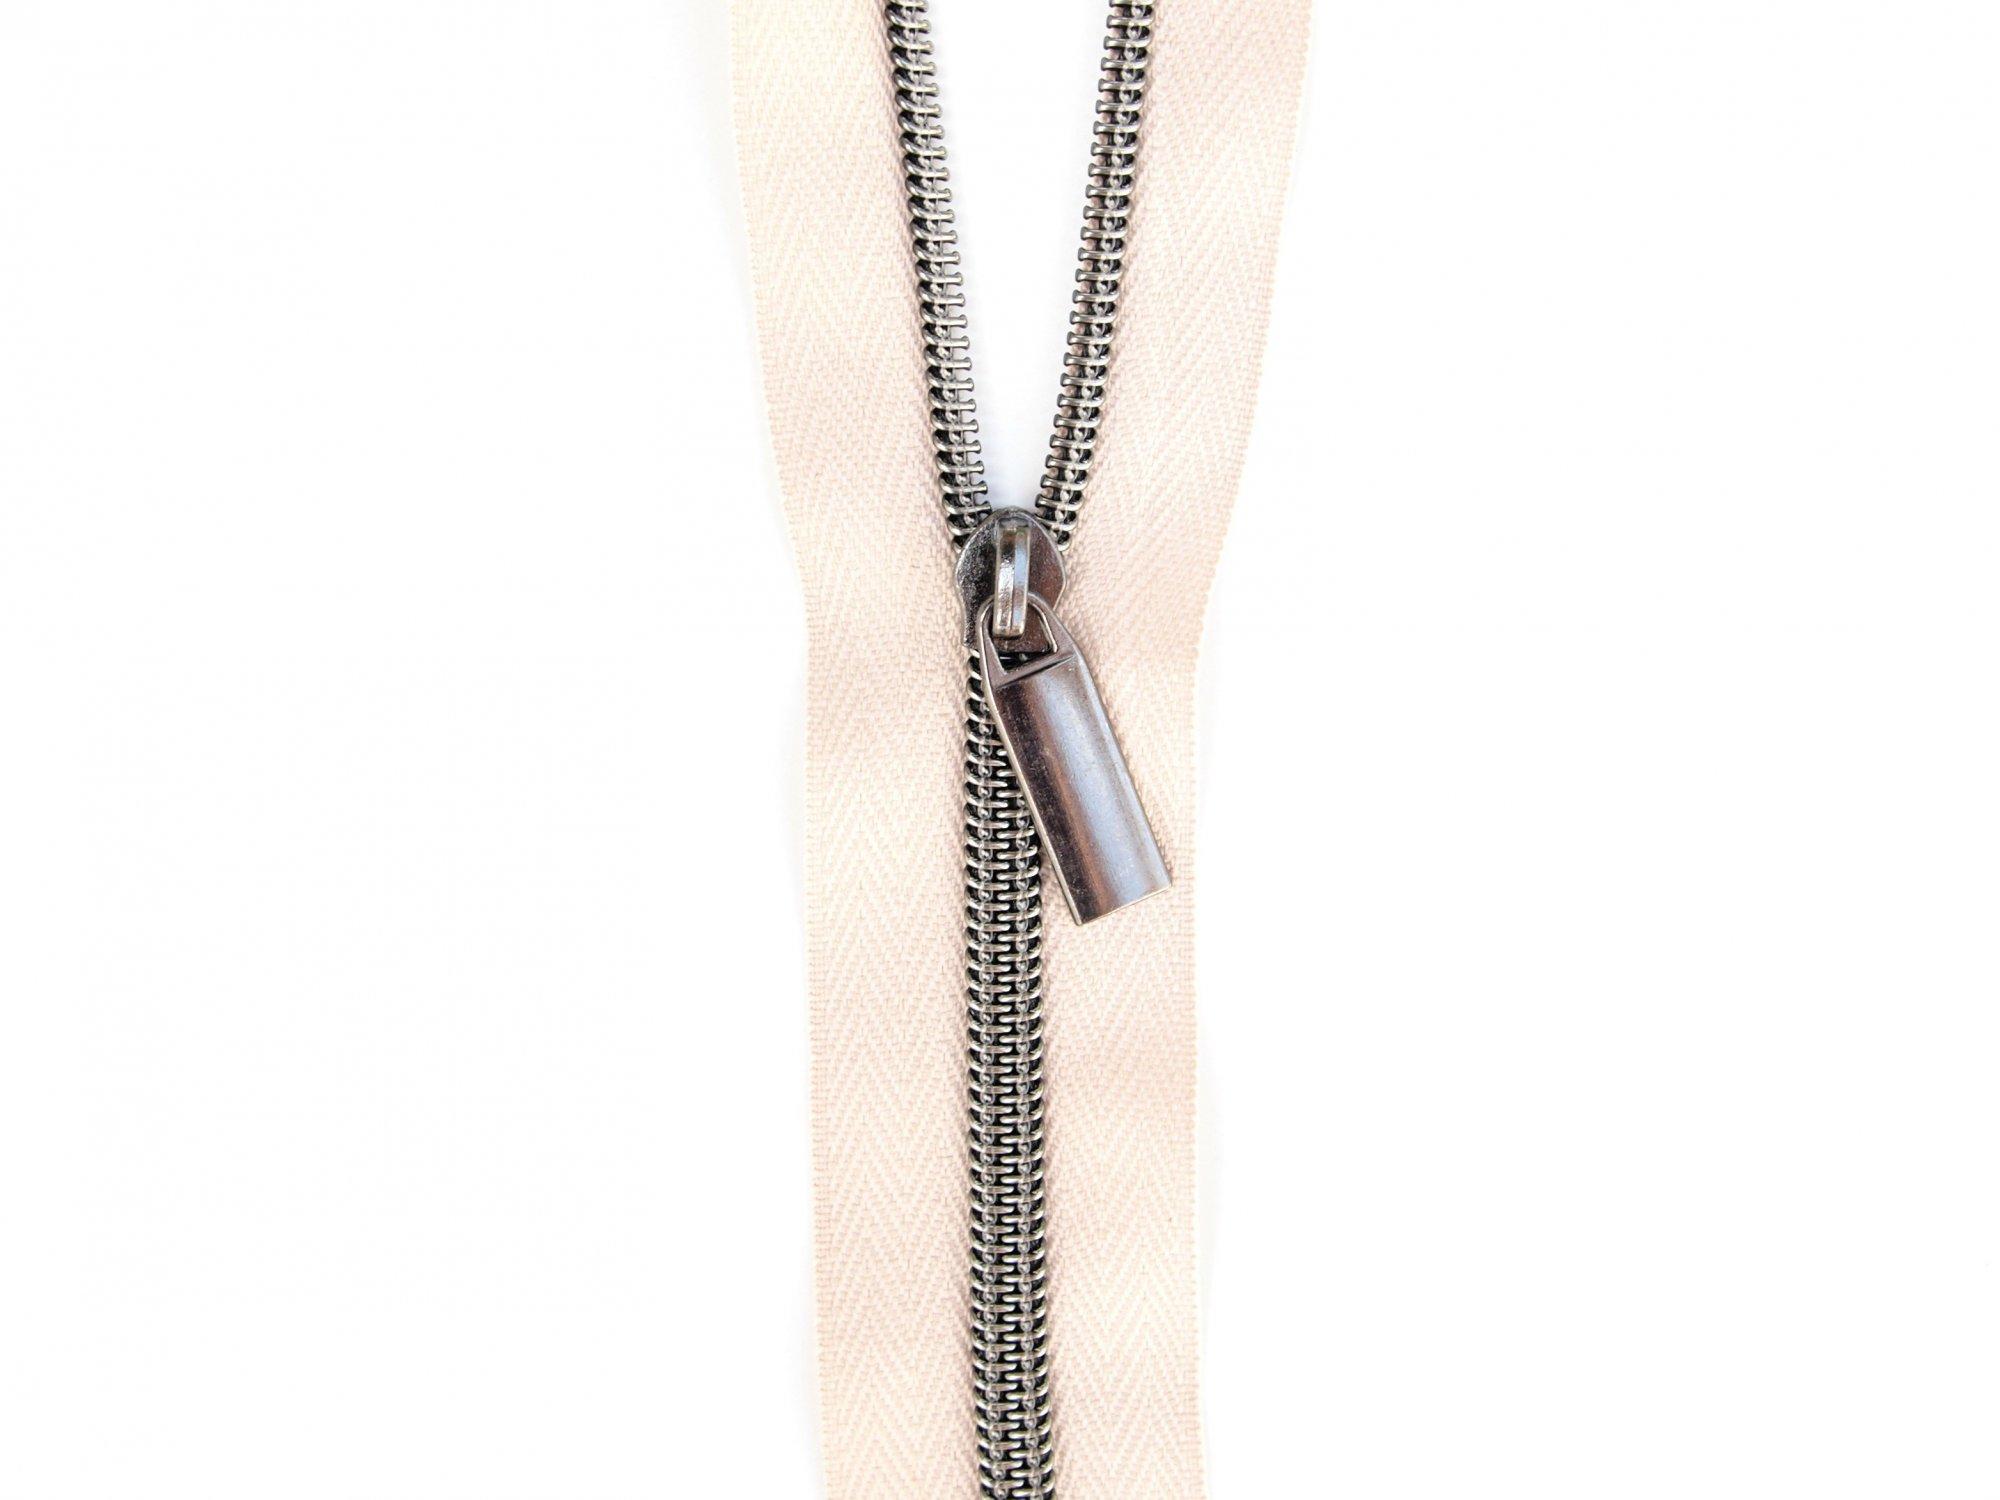 Zipper Tape - Beige Tape & Gunmetal Zipper